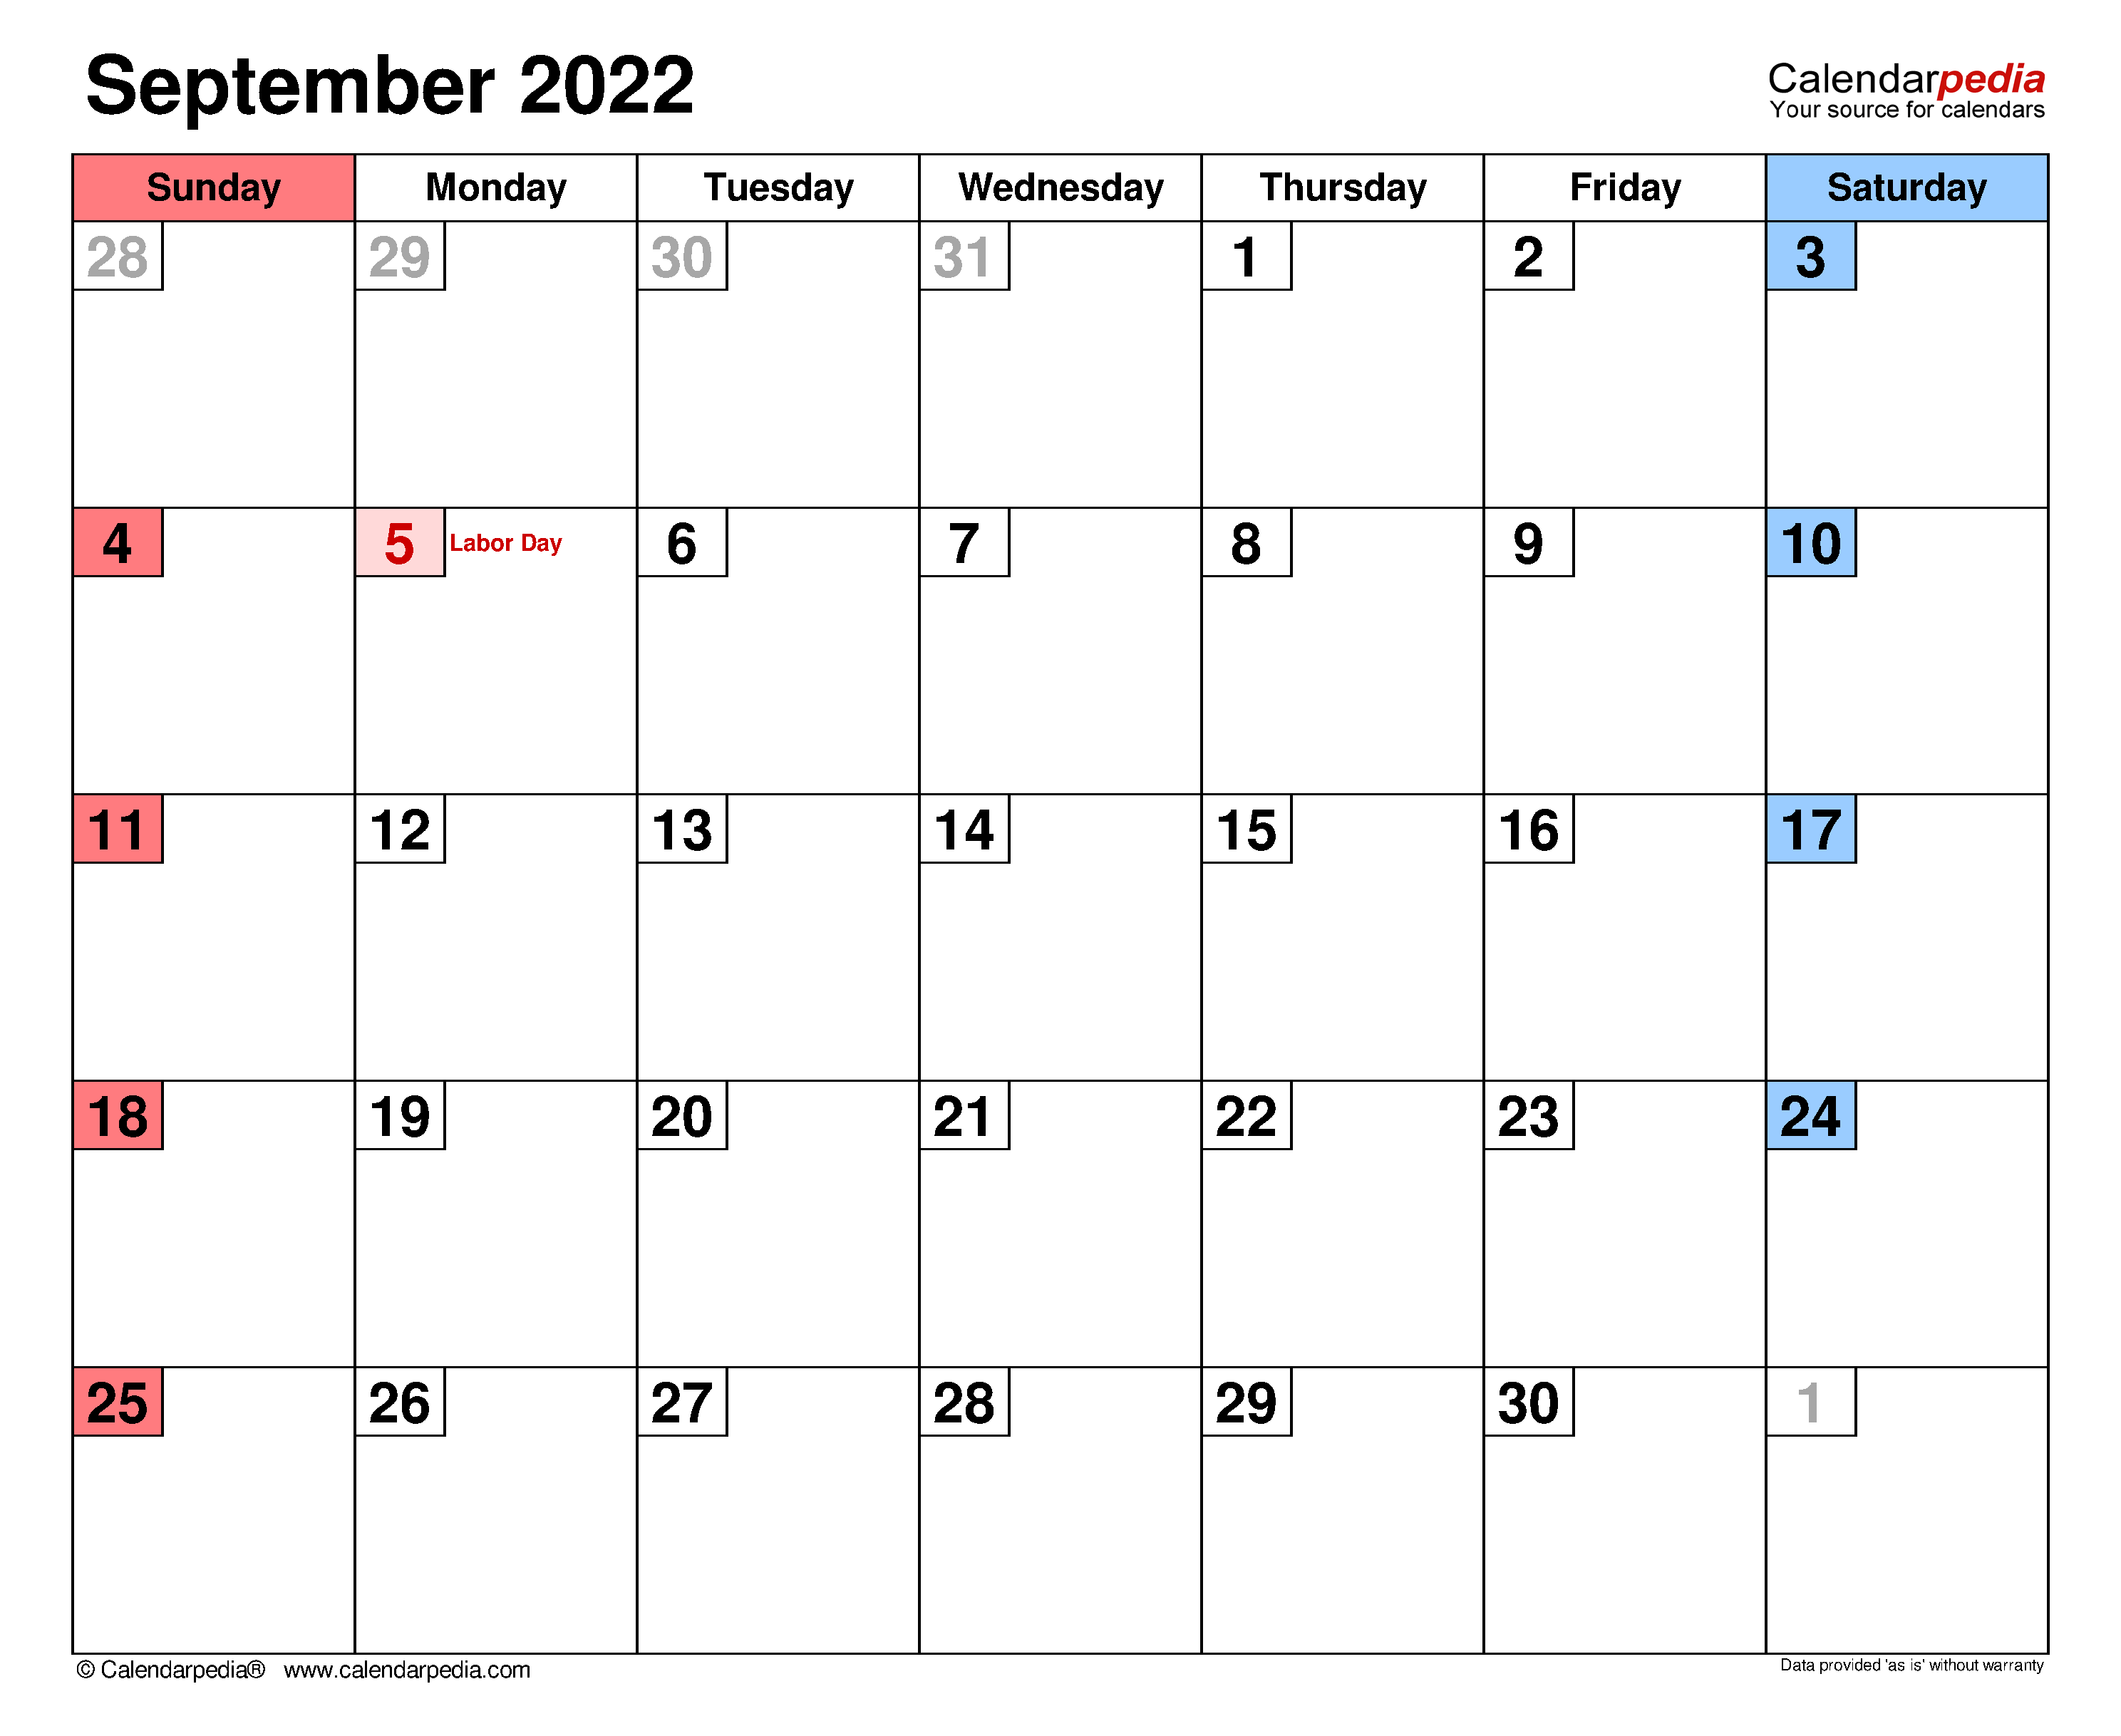 Blank September 2022 Calendar.September 2022 Calendar Templates For Word Excel And Pdf